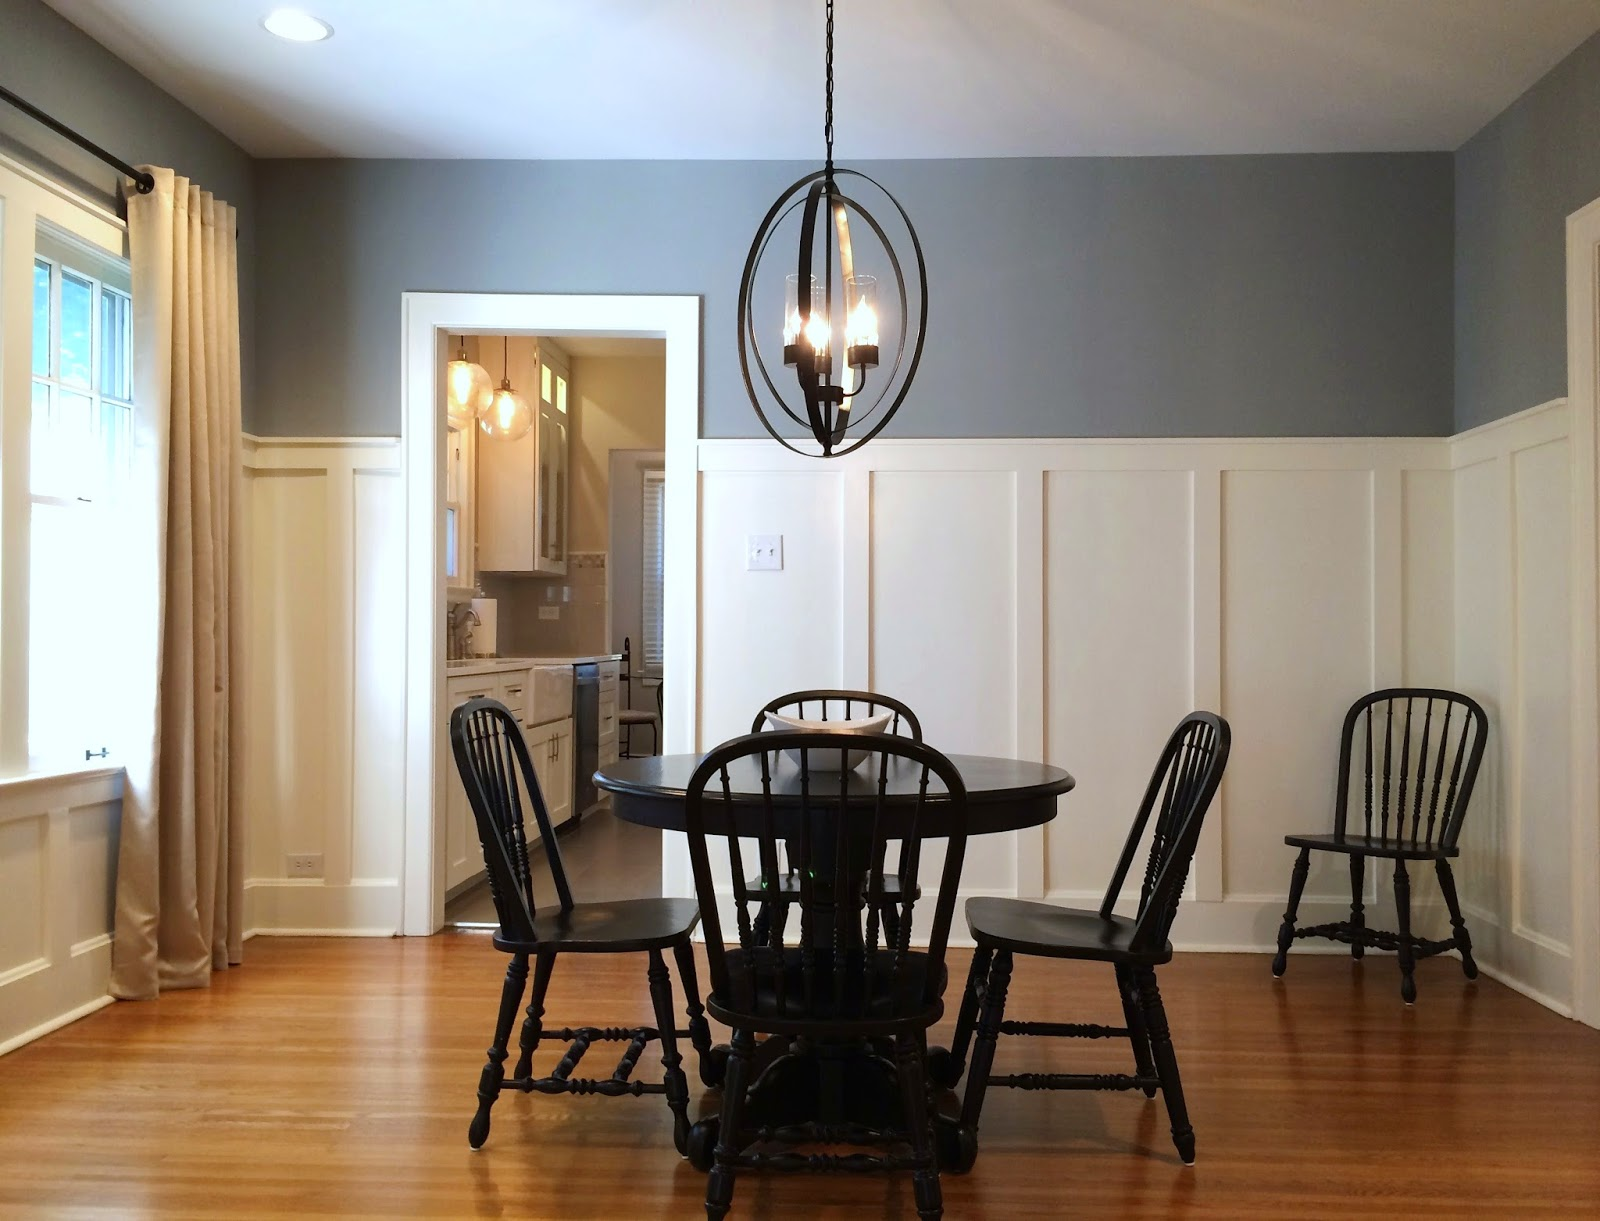 bungalow dining room   BUNGALOW DINING ROOM REVEAL   ELZ DESIGN